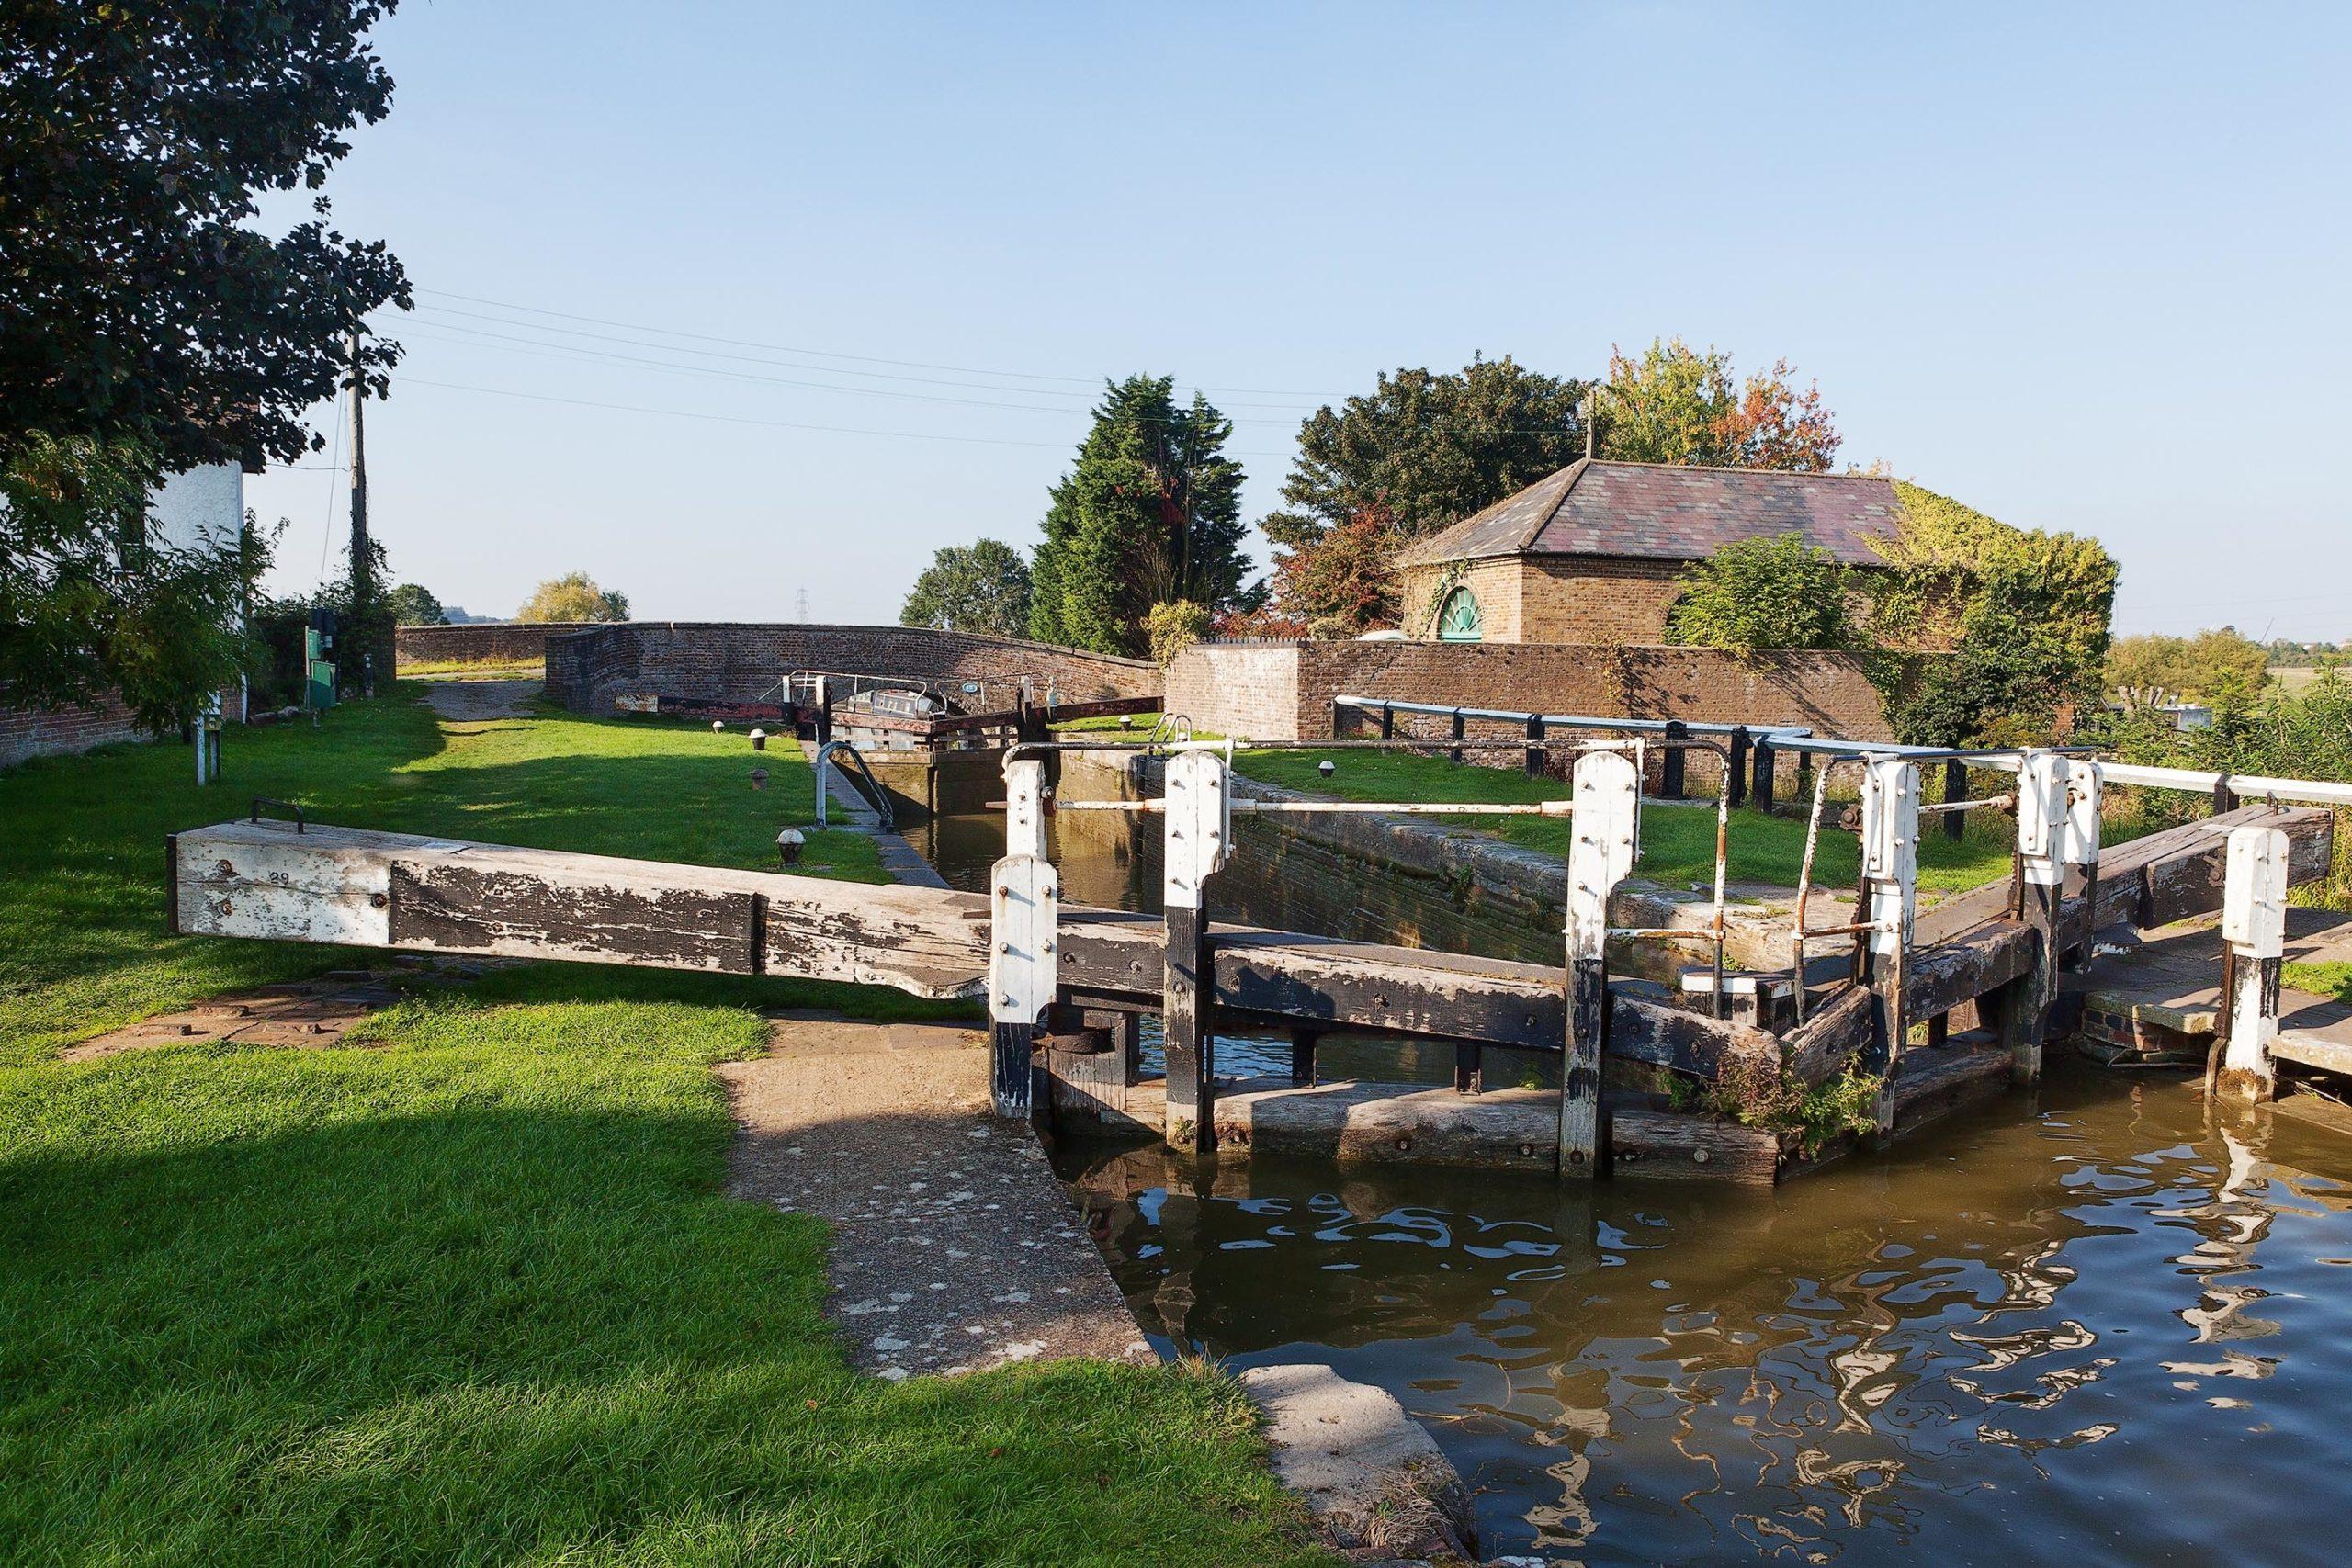 Grand Union Canal at Church Lock